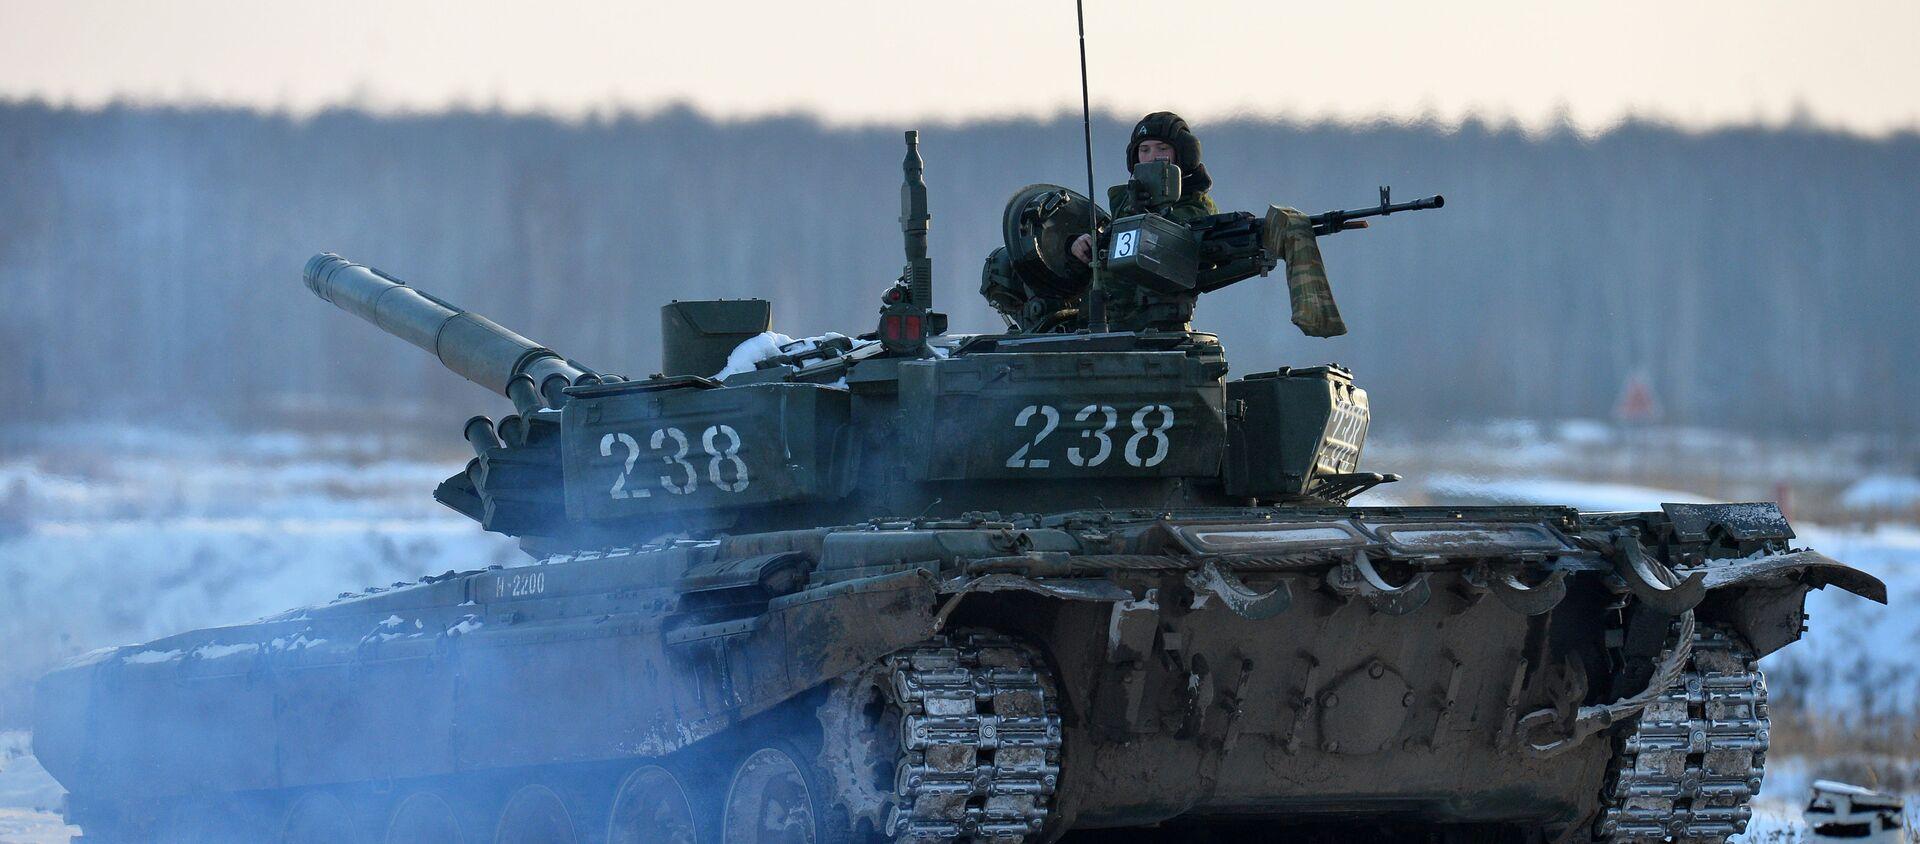 Танк Т-72, архивное фото - Sputnik Беларусь, 1920, 09.03.2021